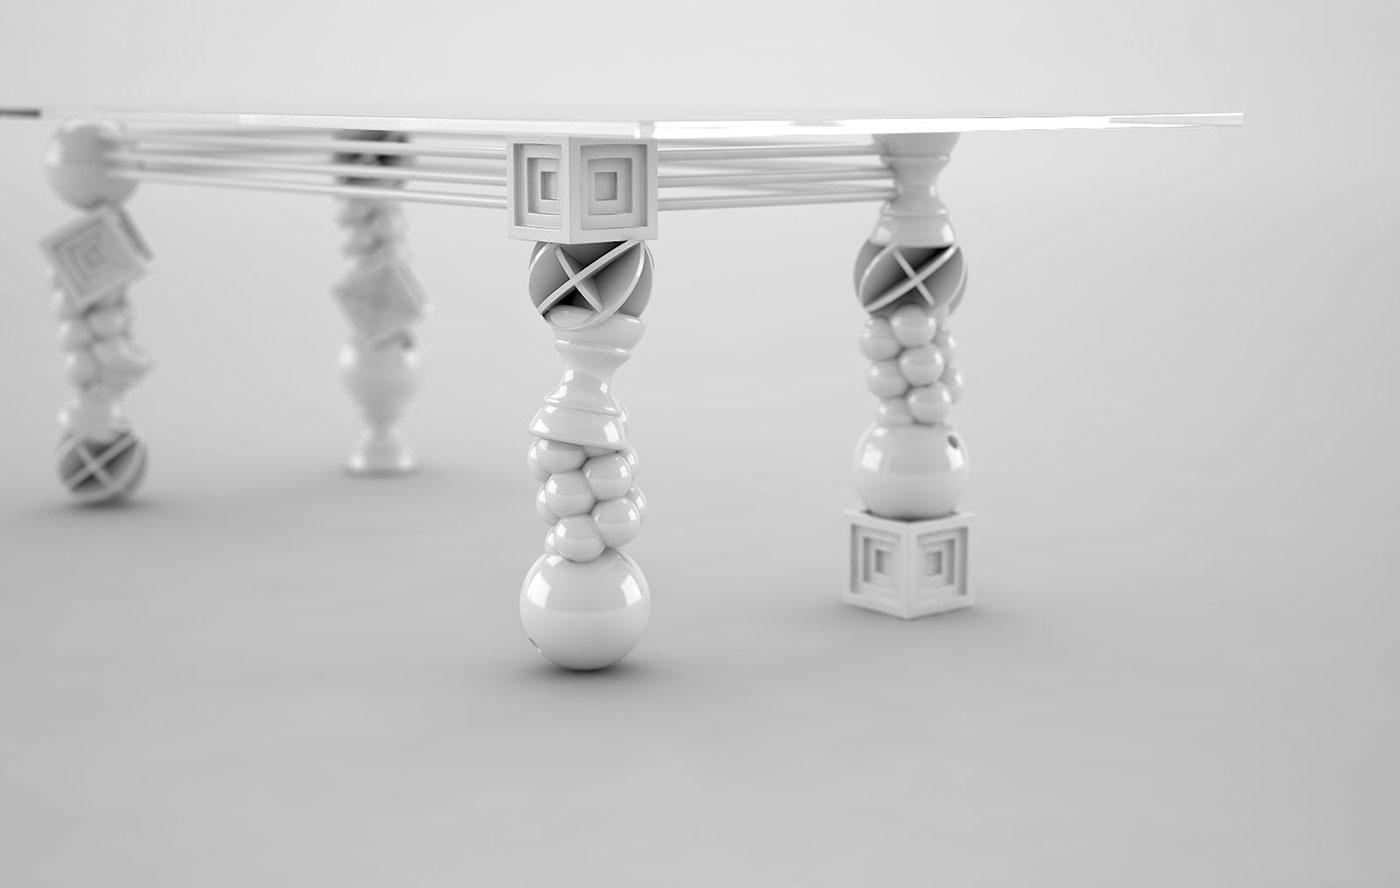 Adobe Portfolio tchotchke toy kitsch White black gold table furniture contemporary